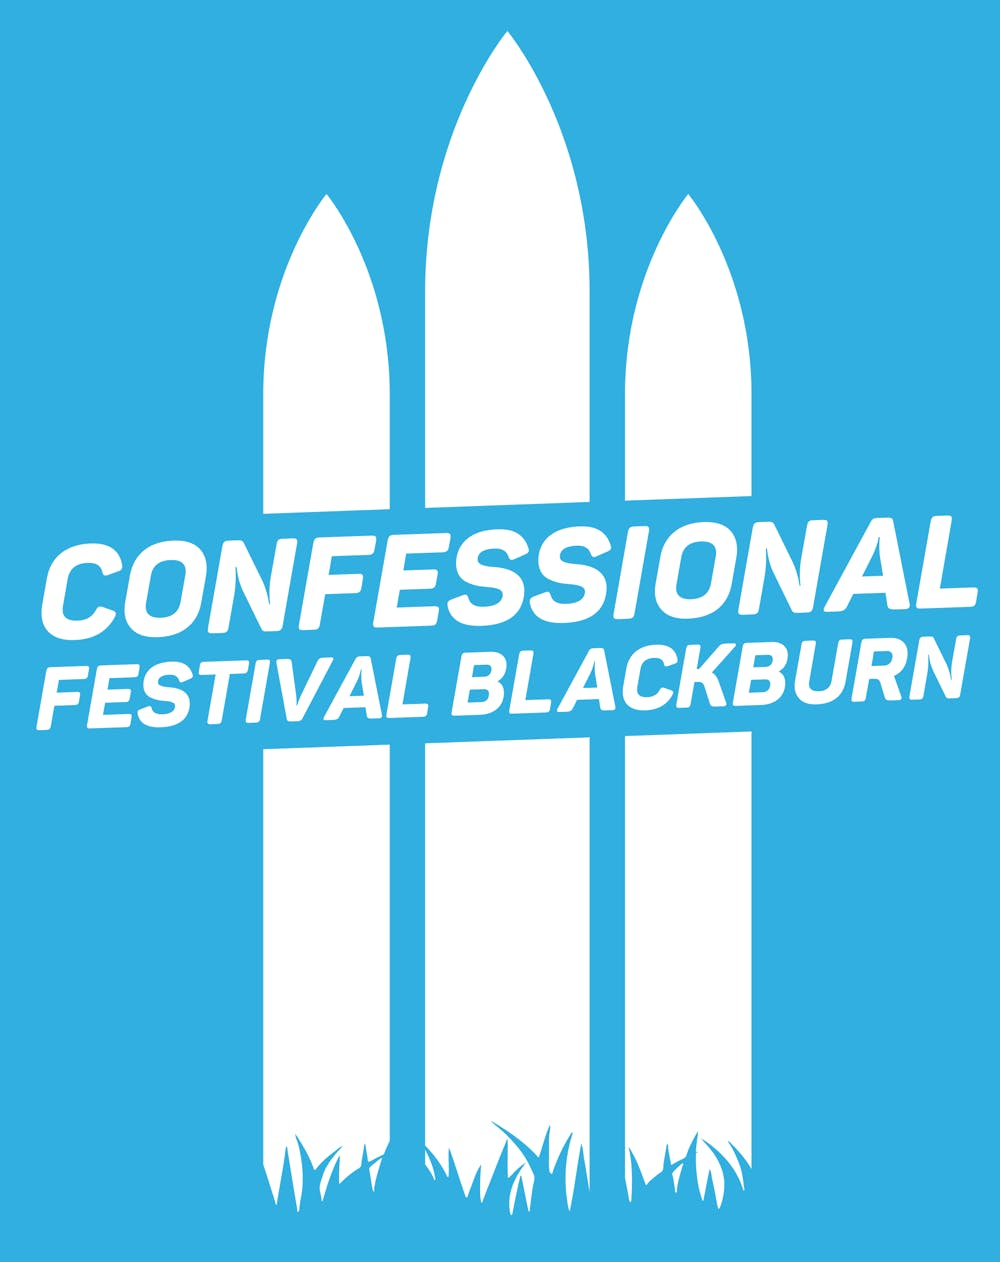 Confessional Festival